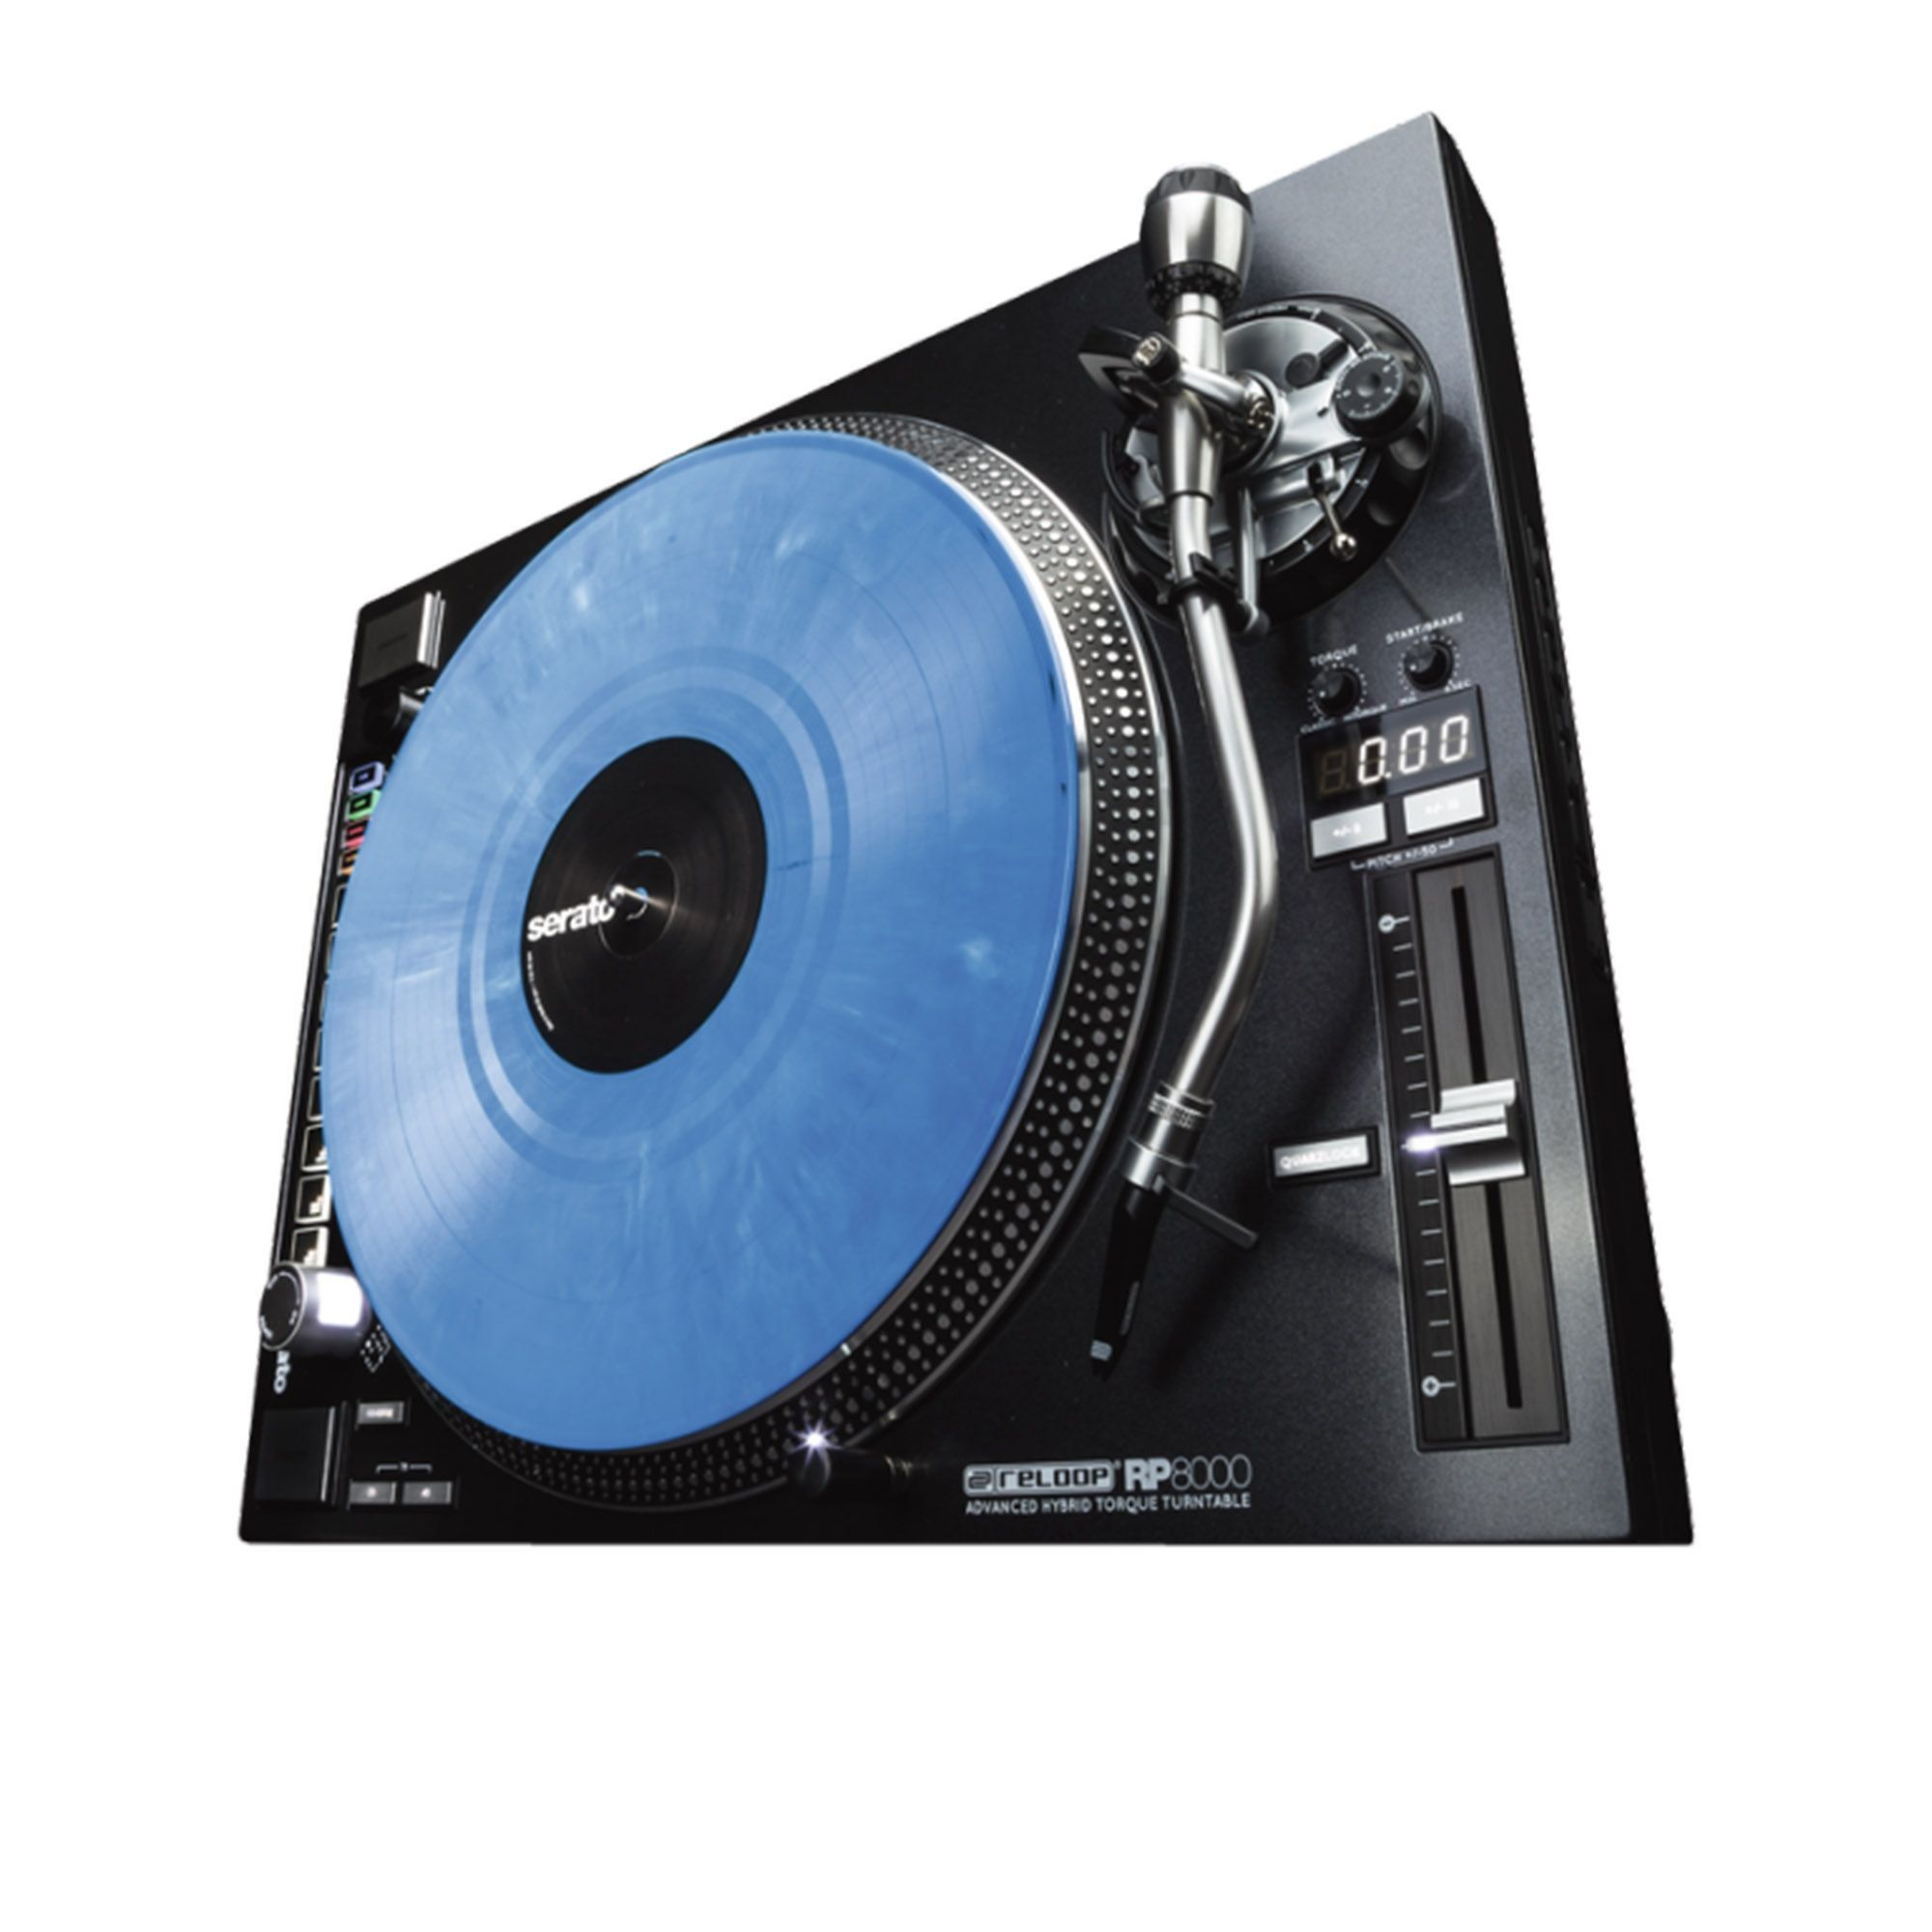 Reloop RP8000 Toca-disco Dj Reloop-RP8000 Direct Drive